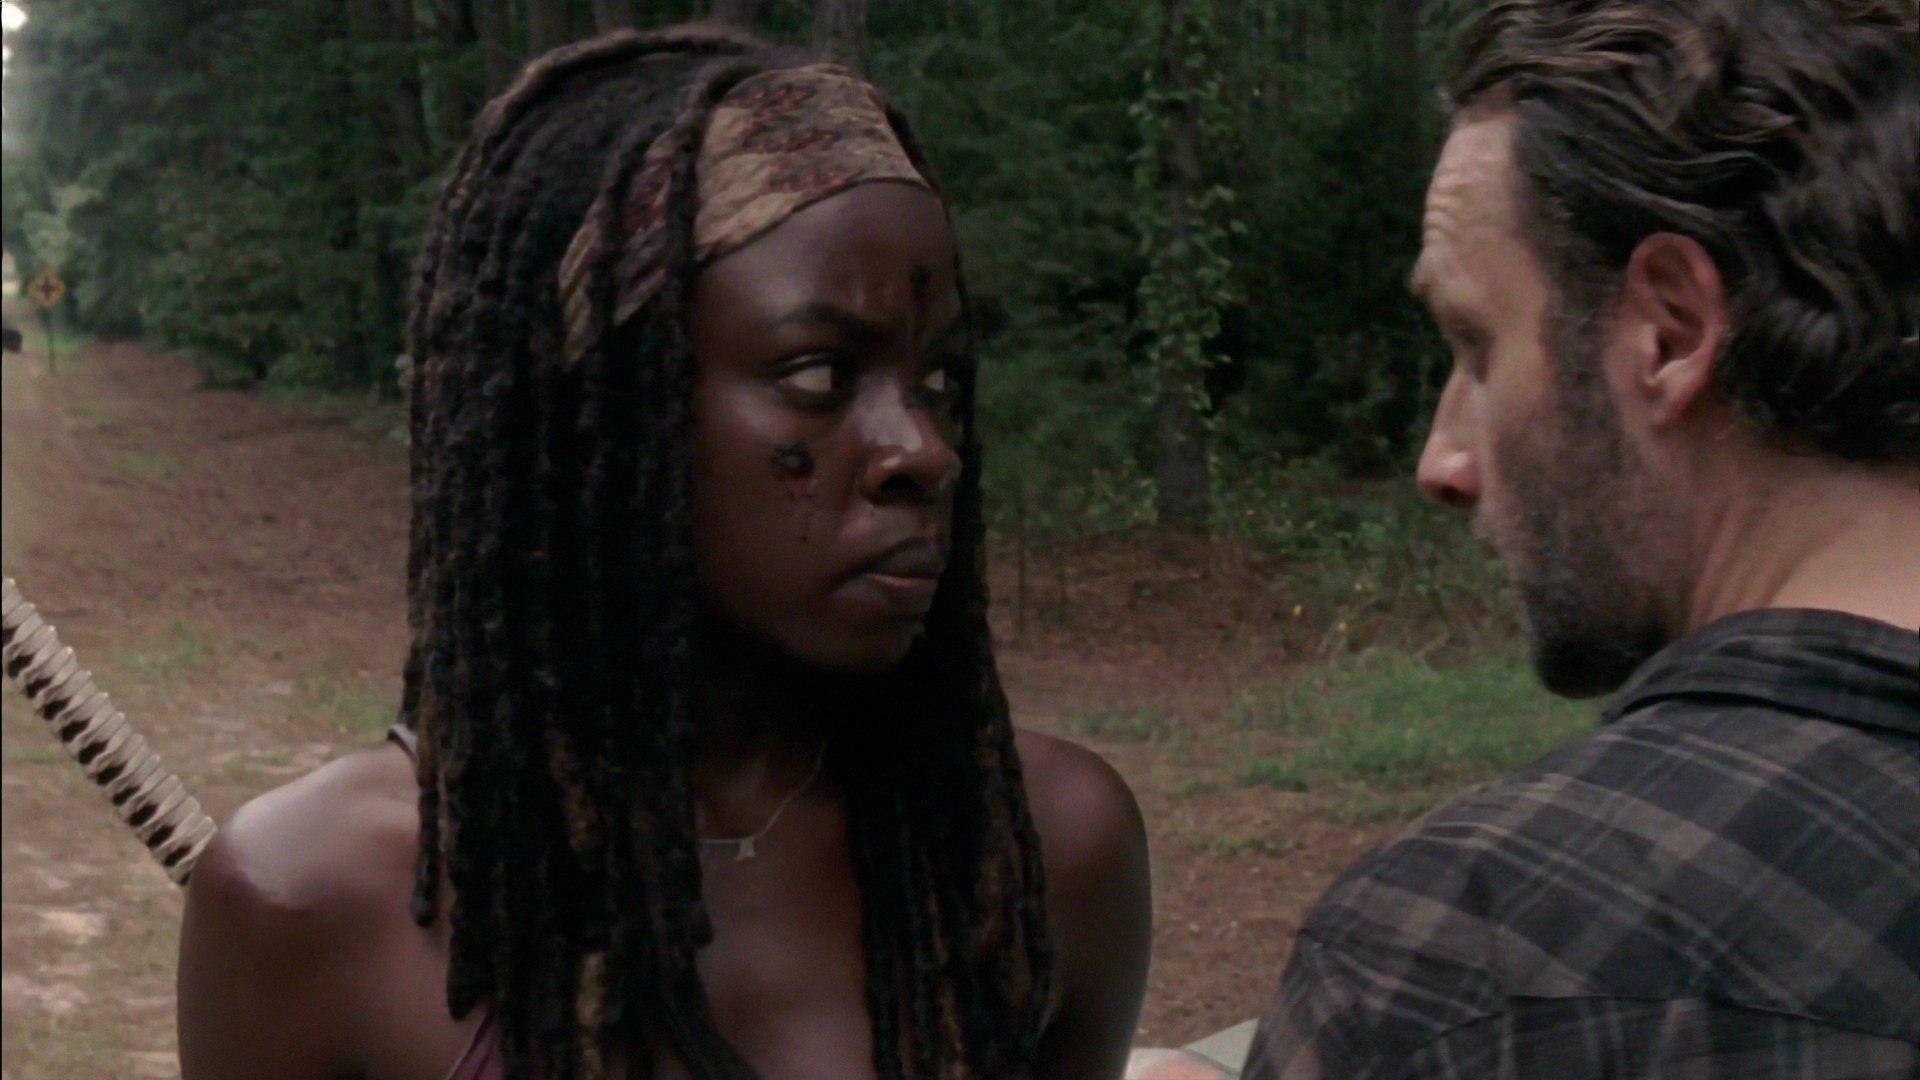 'The Walking Dead' Season 3 Episode 9 Captures